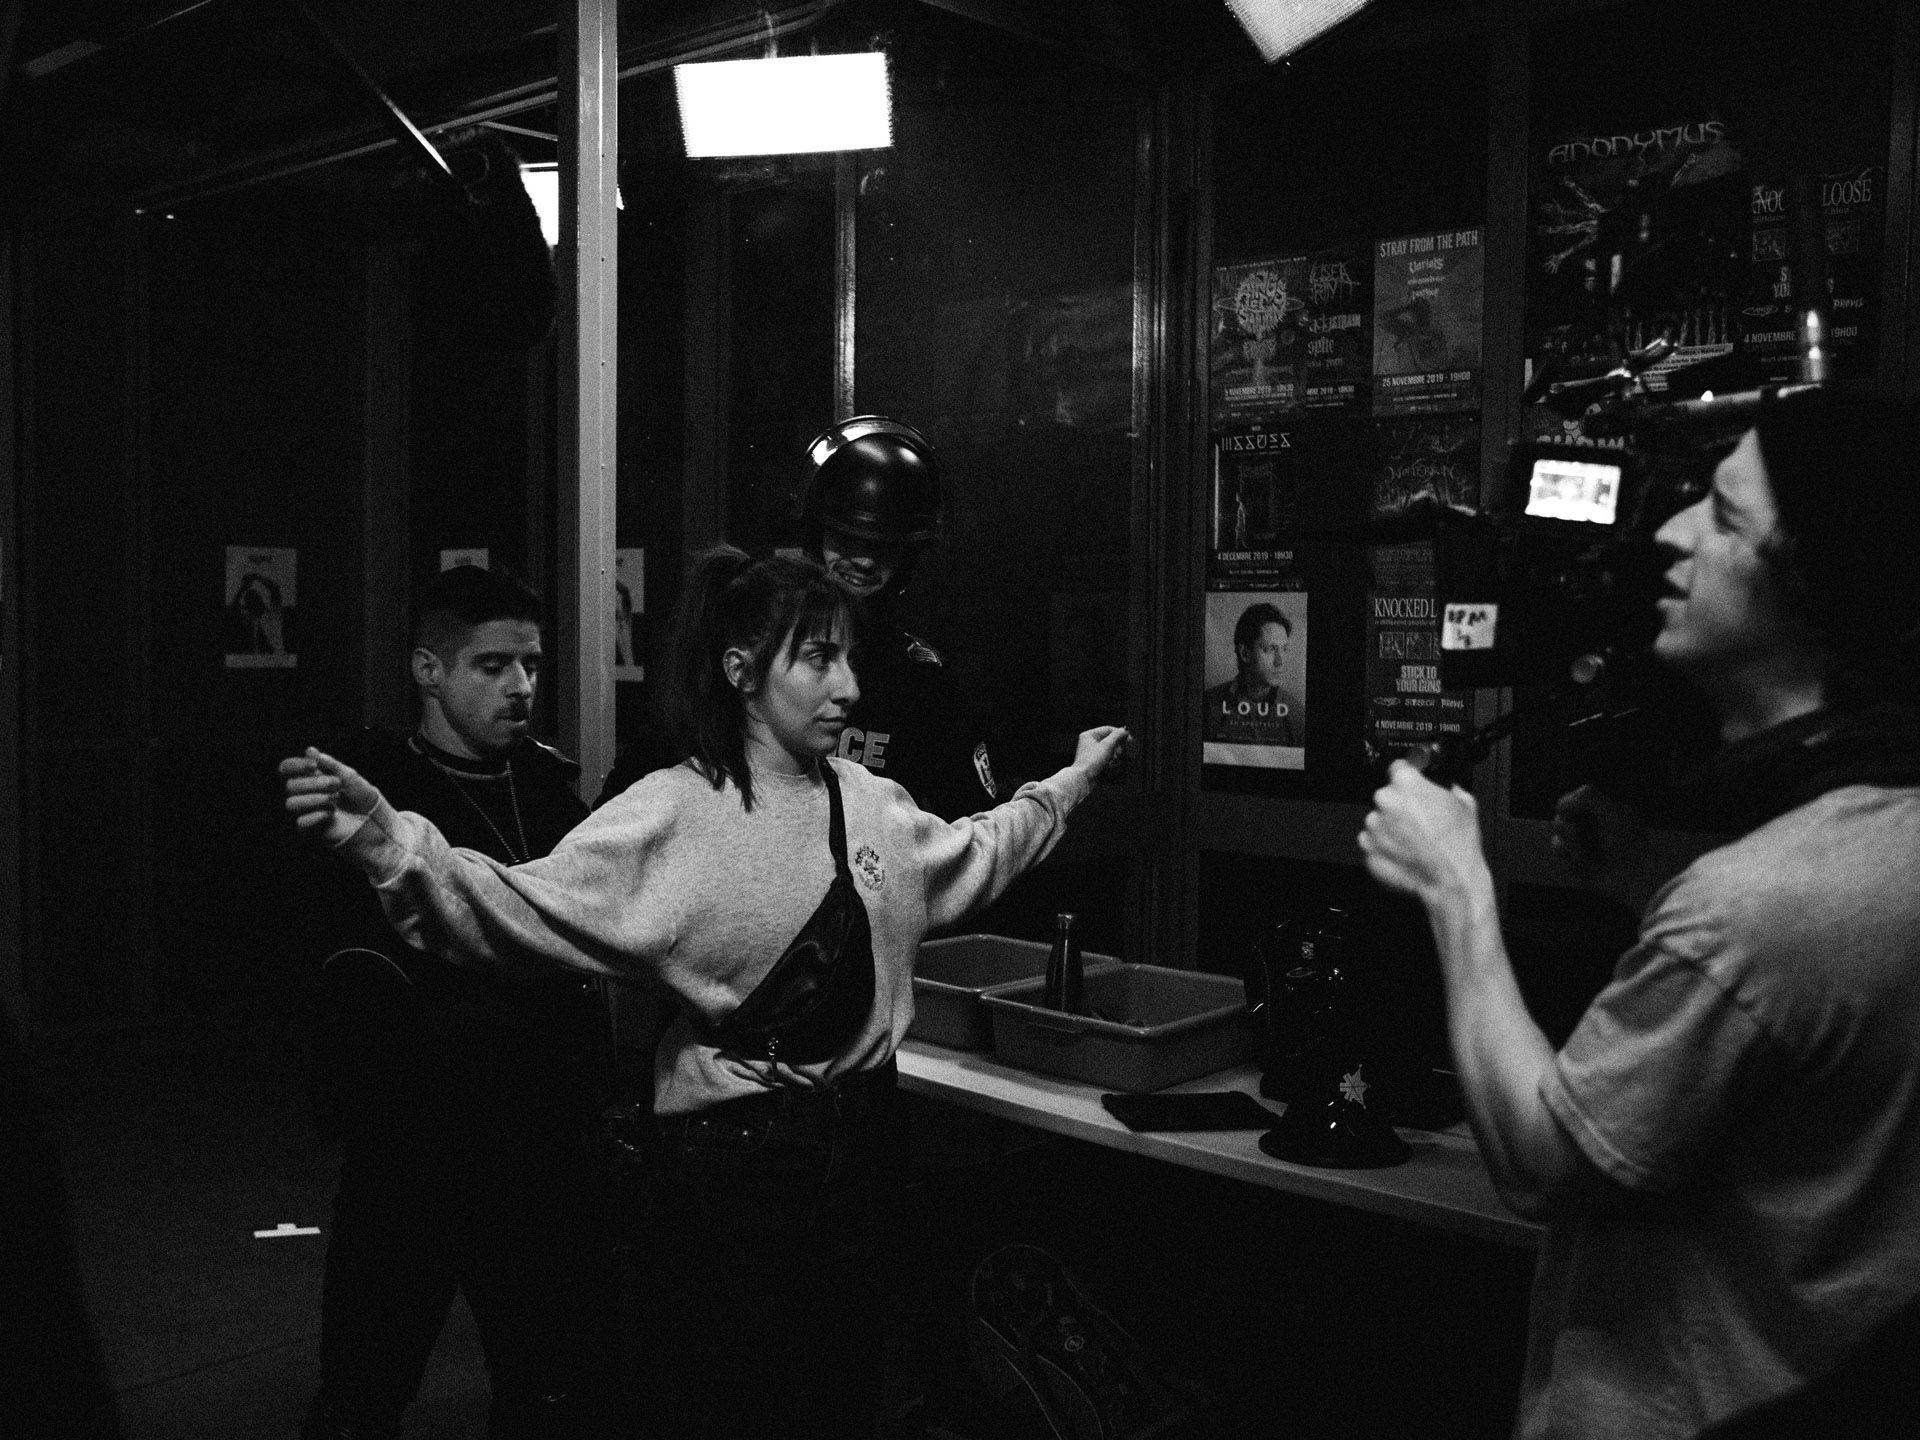 actors Hugolin Chevrette-Landesque and Emile Schneider dressed as cops checking pockets of woman in behind the scenes for TV series La Loi C'est La Loi filmed by Les Gamins for TV5 Unis